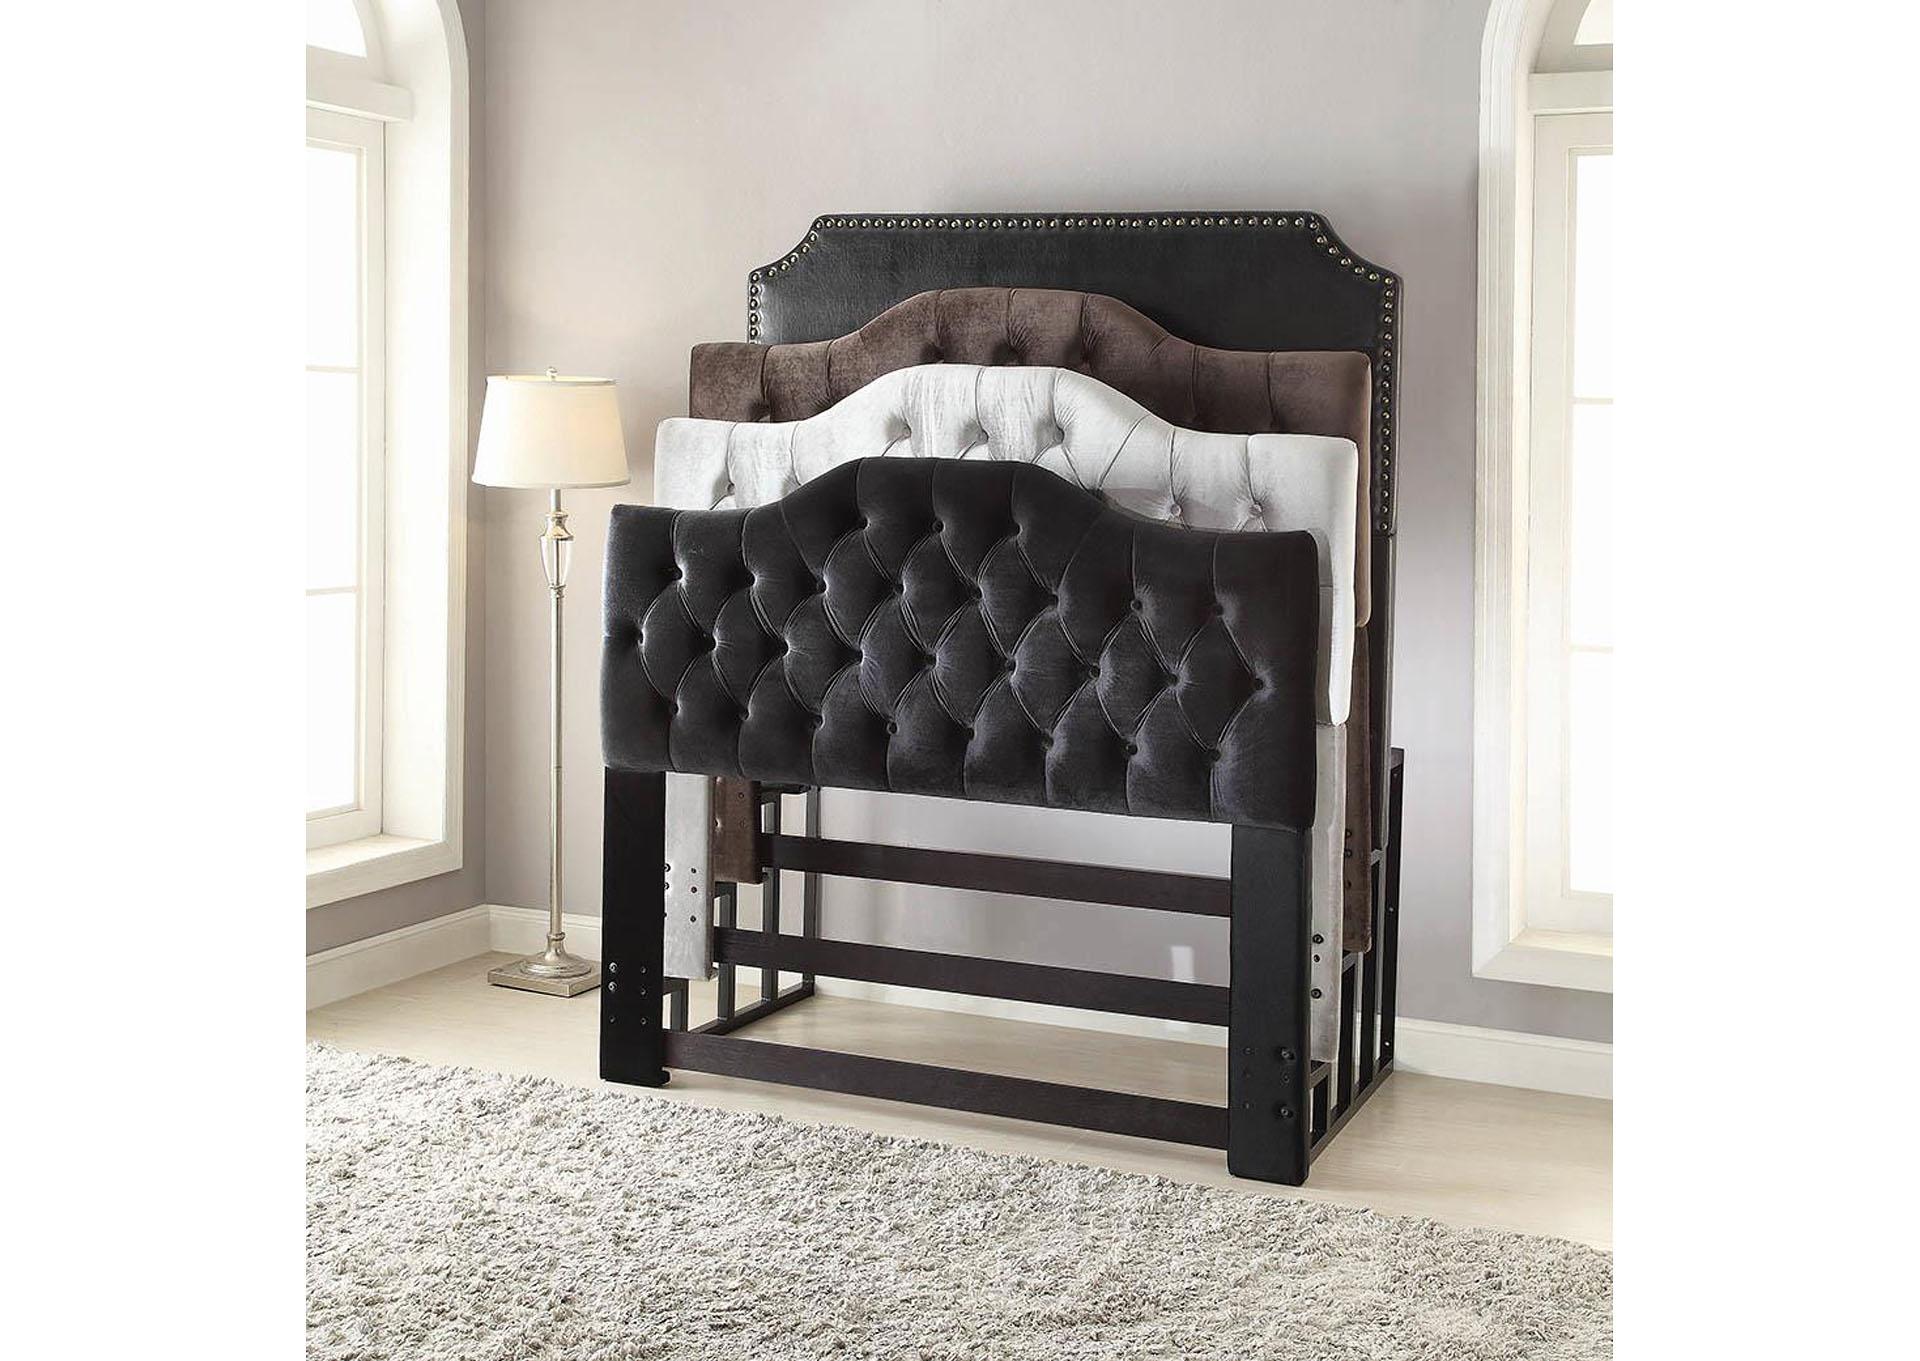 Black Headboard Rack,Coaster Furniture